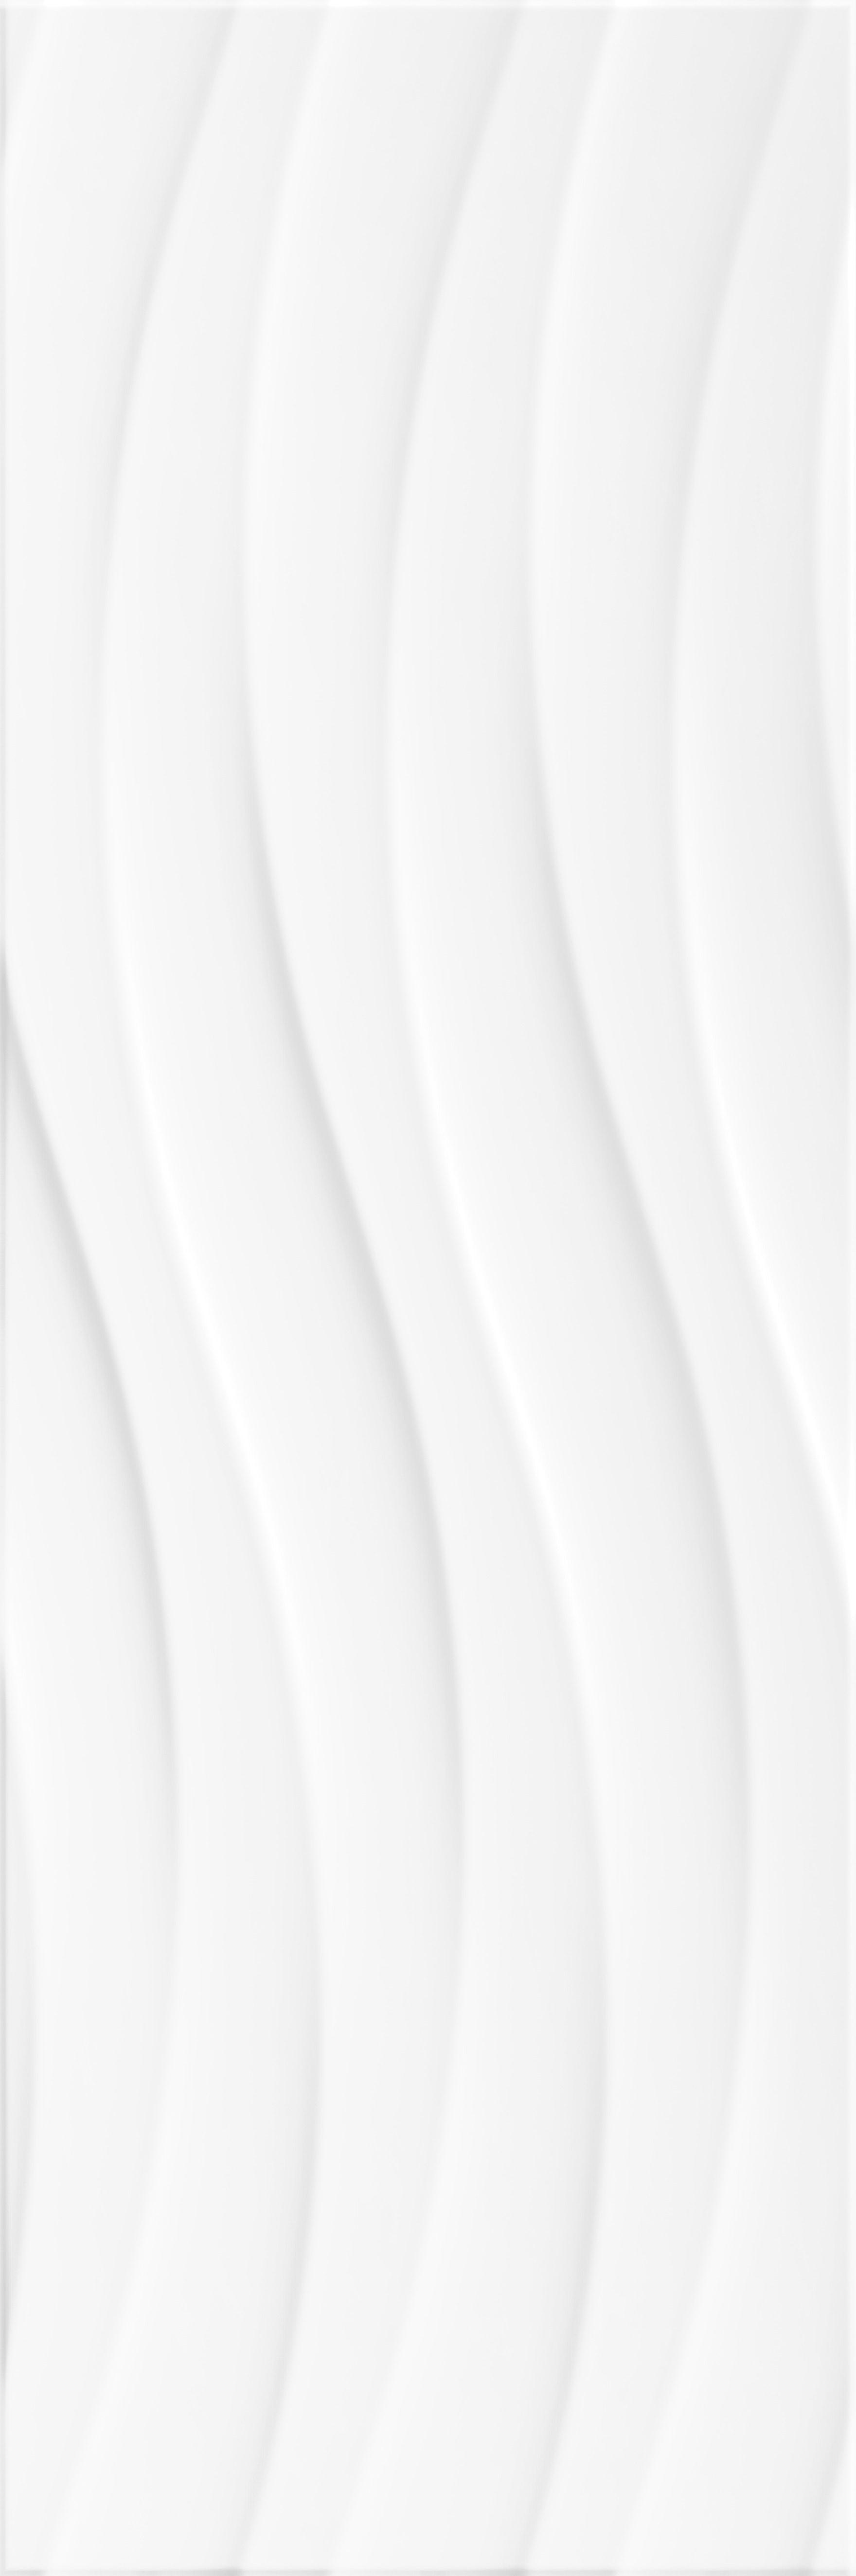 White Bend / 10x30 Olympus - Centaurus 0